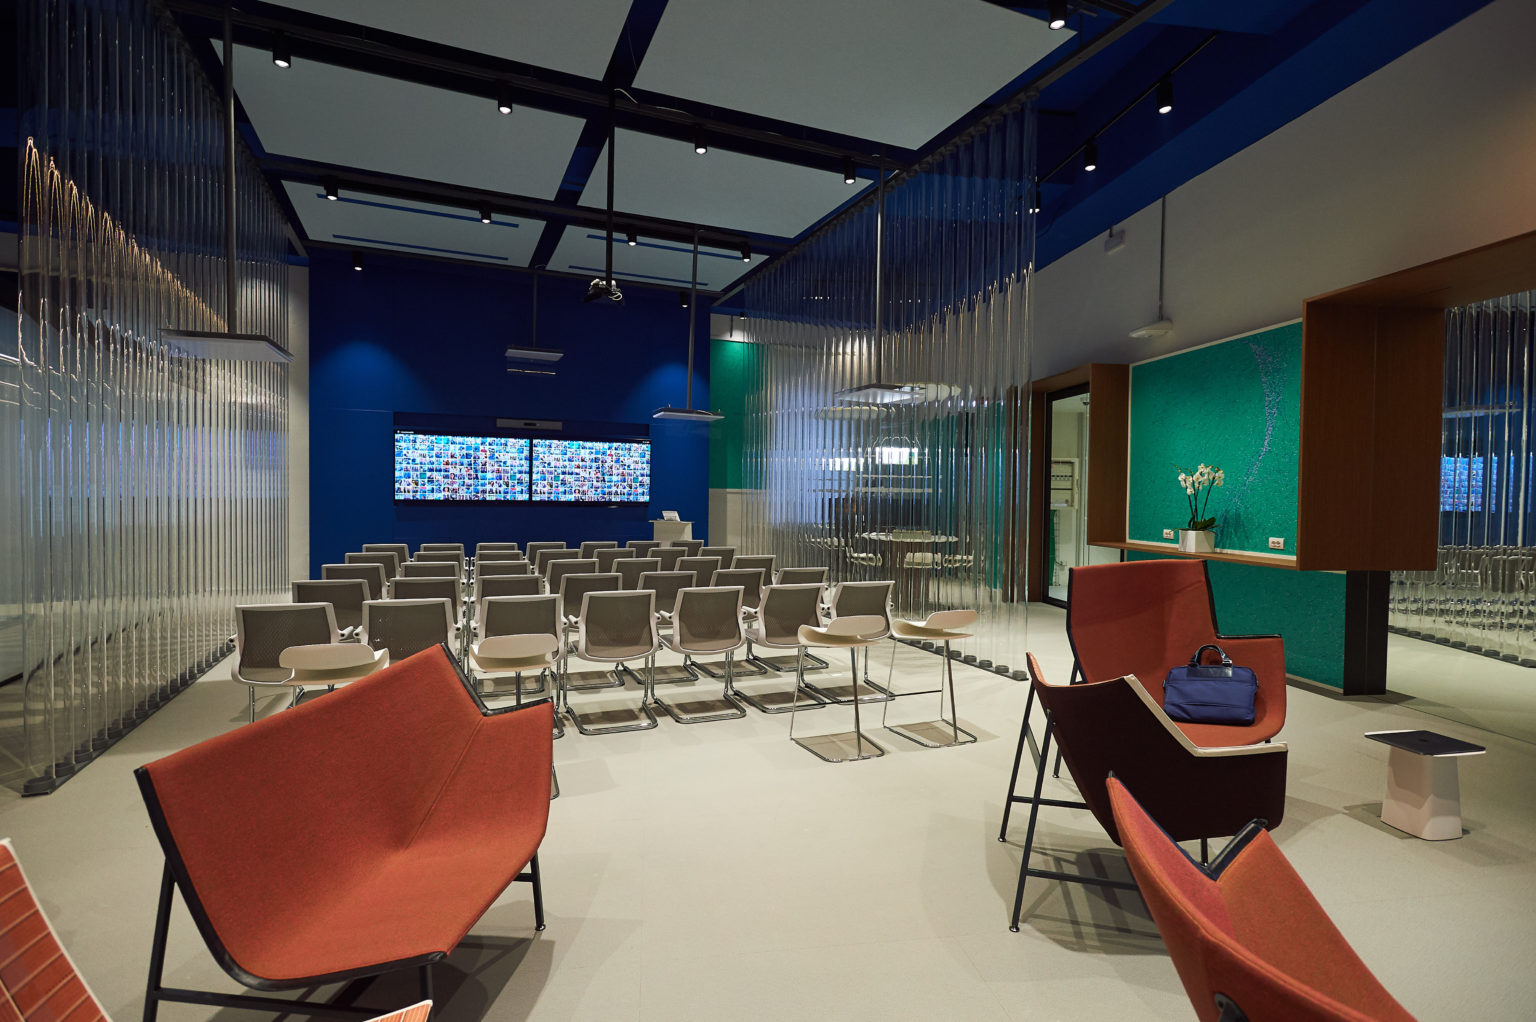 Co-Innovation Center